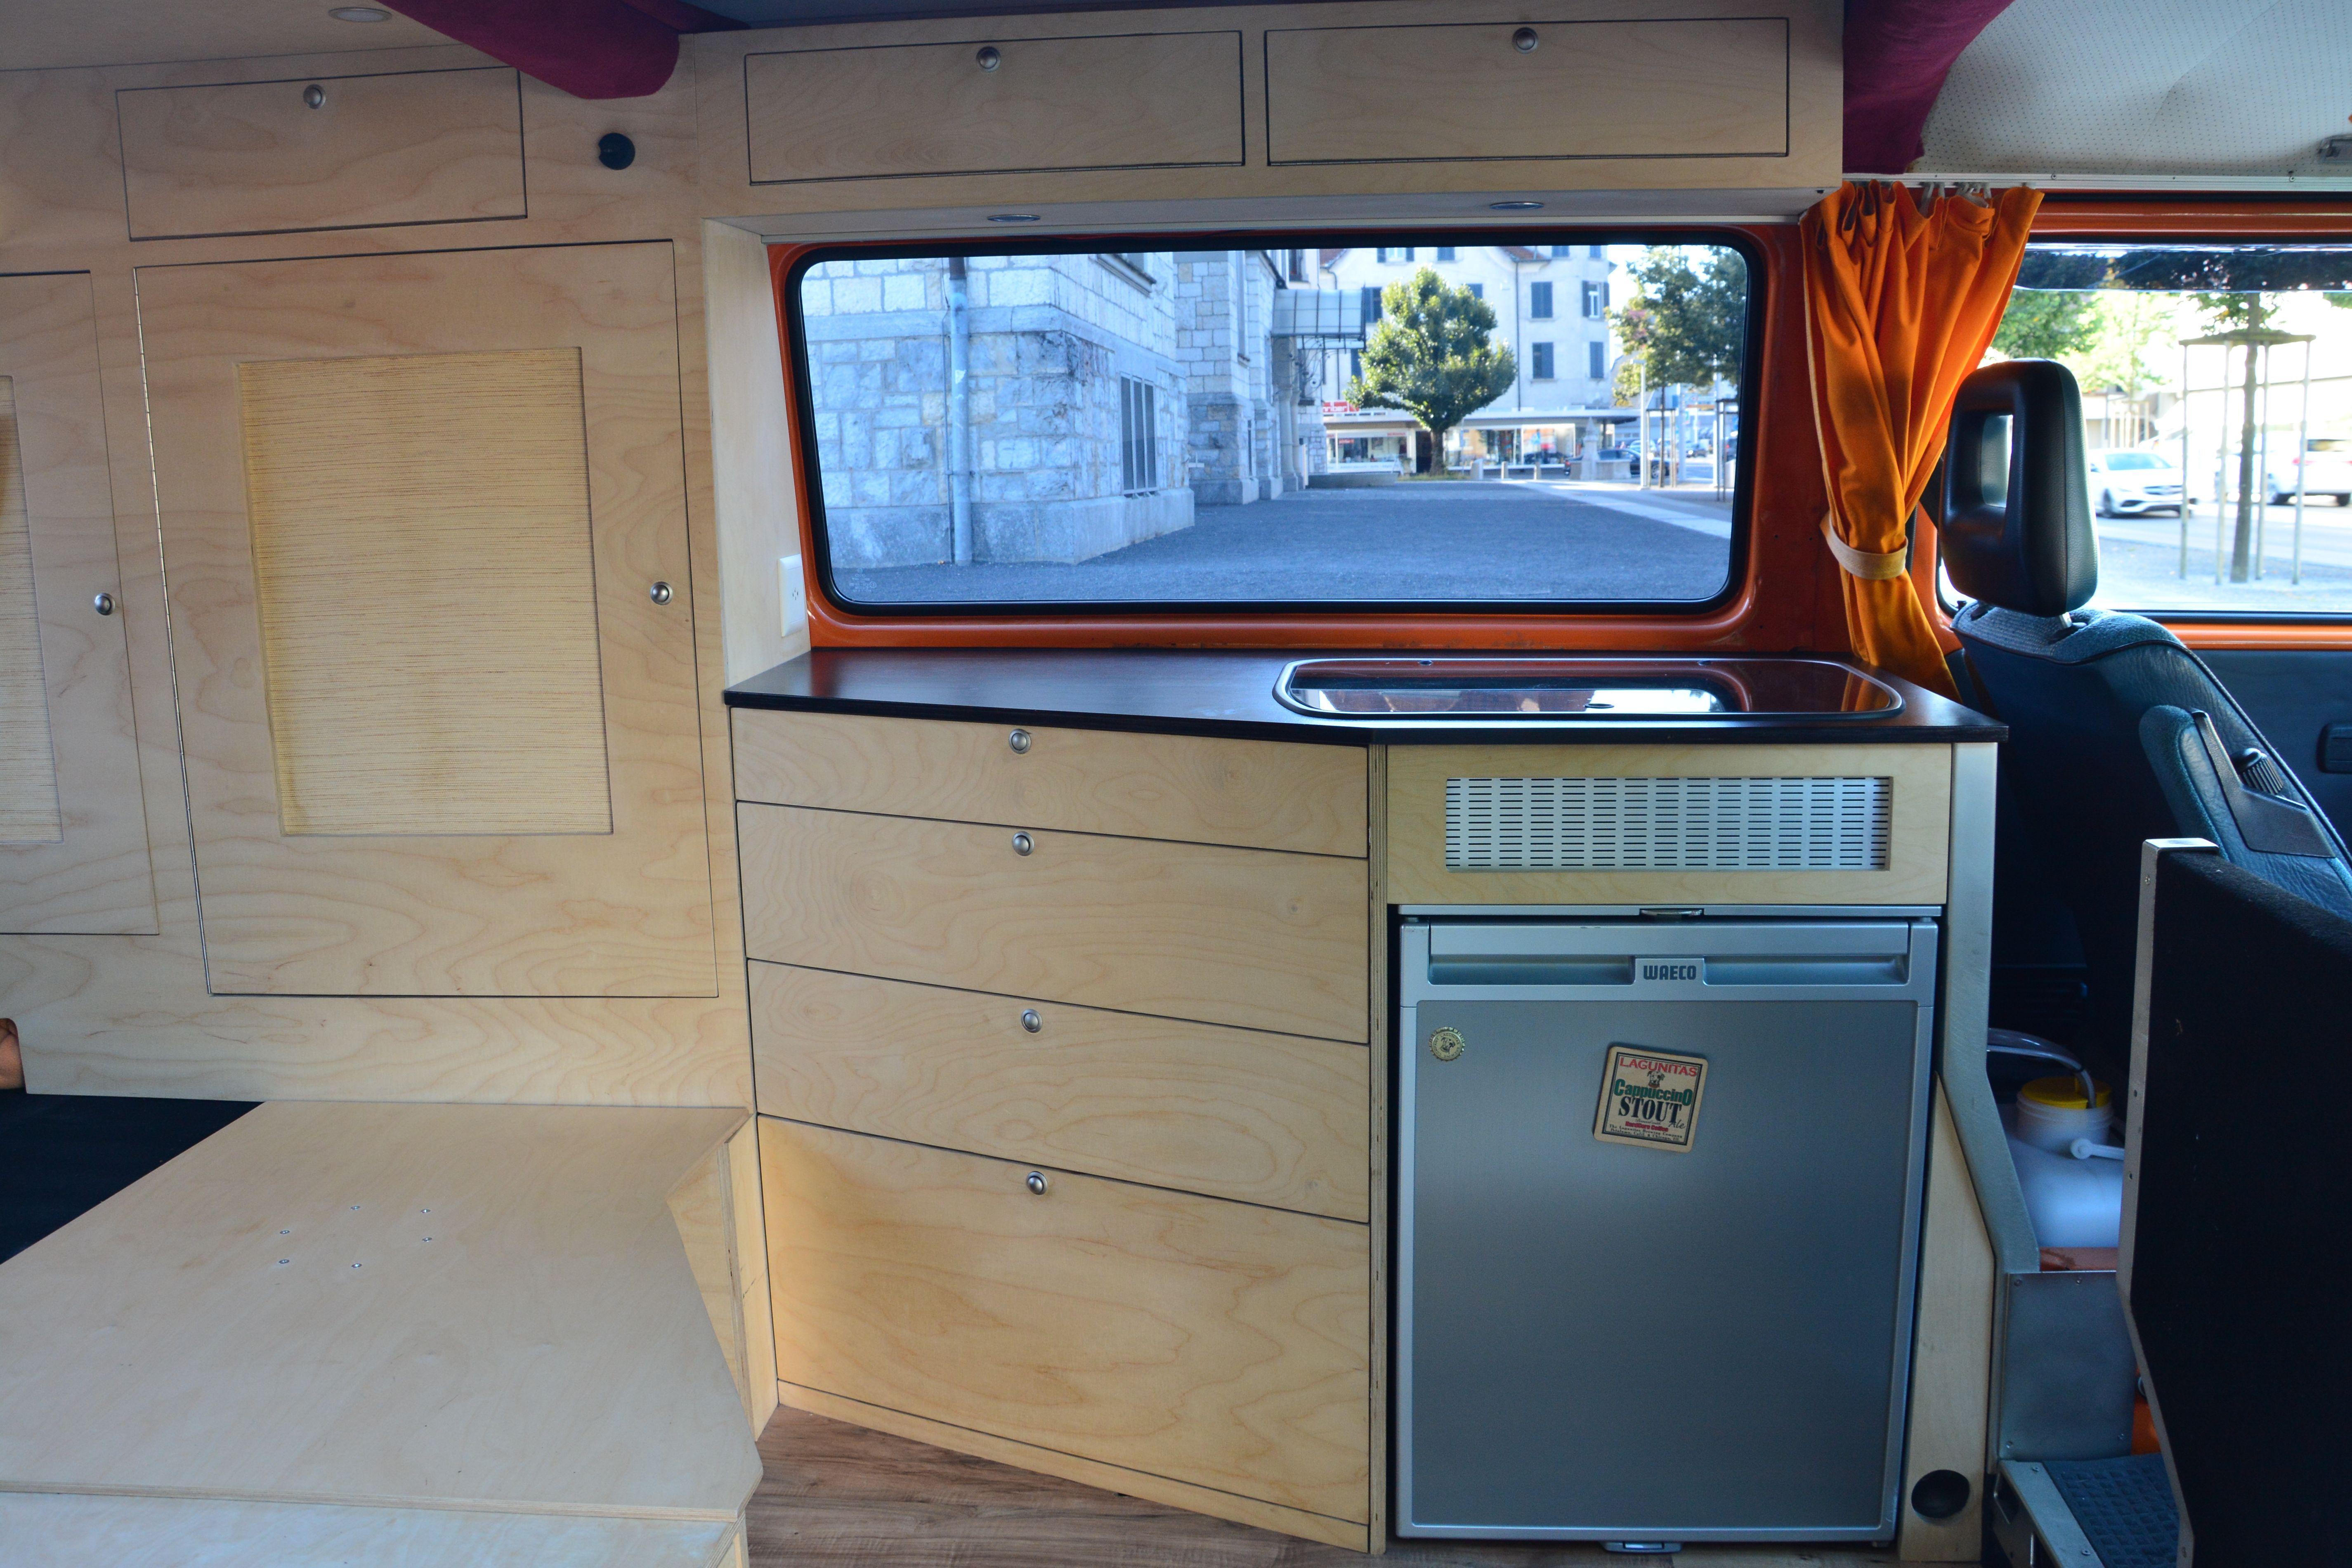 vw t3 k che camperausbau stefan camper ausbau und t3 ausbau. Black Bedroom Furniture Sets. Home Design Ideas